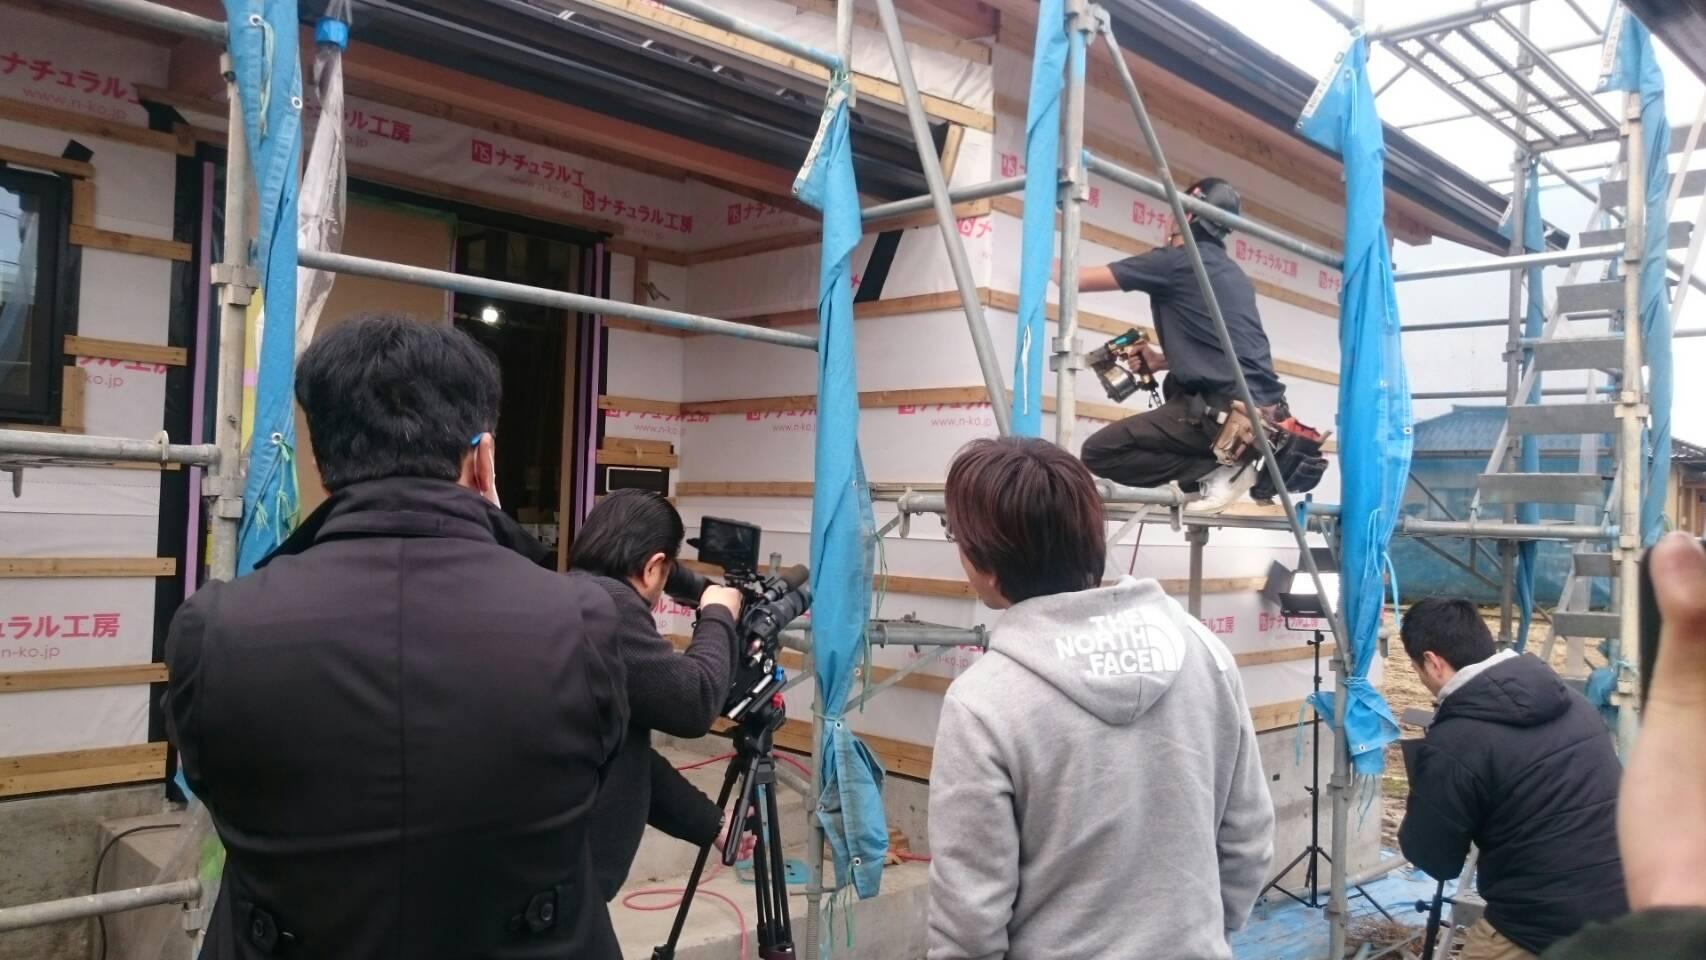 http://n-ko.jp/staffblog/7331111111.jpg